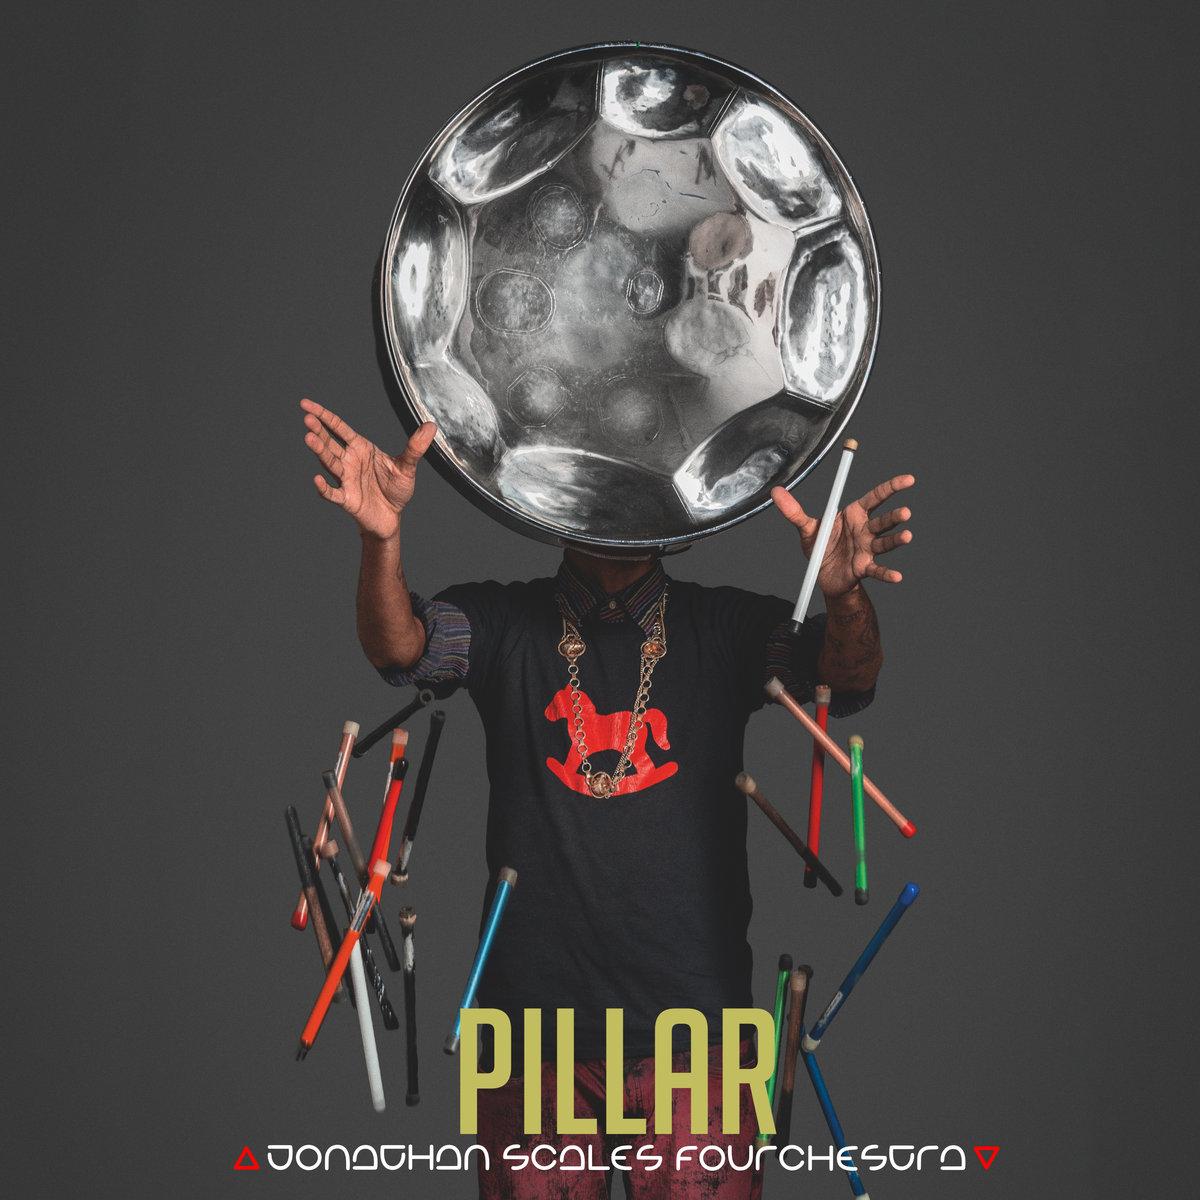 Album Review: PILLAR by Jonathan Scales Fourchestra – PAN